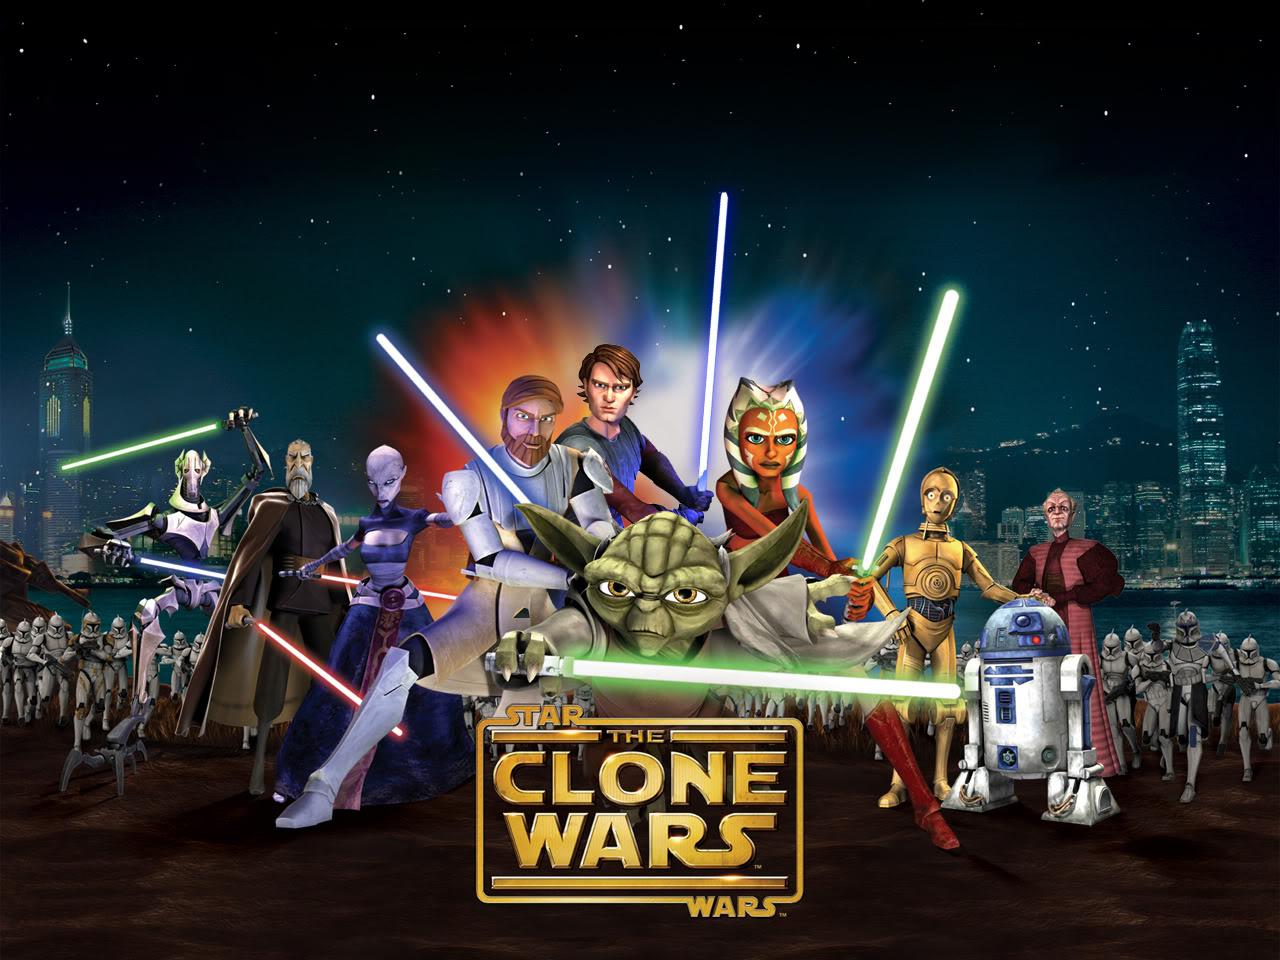 http://3.bp.blogspot.com/-LZvpcRy6kyM/T_BbUFYtm1I/AAAAAAAADJg/zuHcfwKt6iw/s1600/Star-Wars-The-Clone-Wars-Wallpaper.jpg